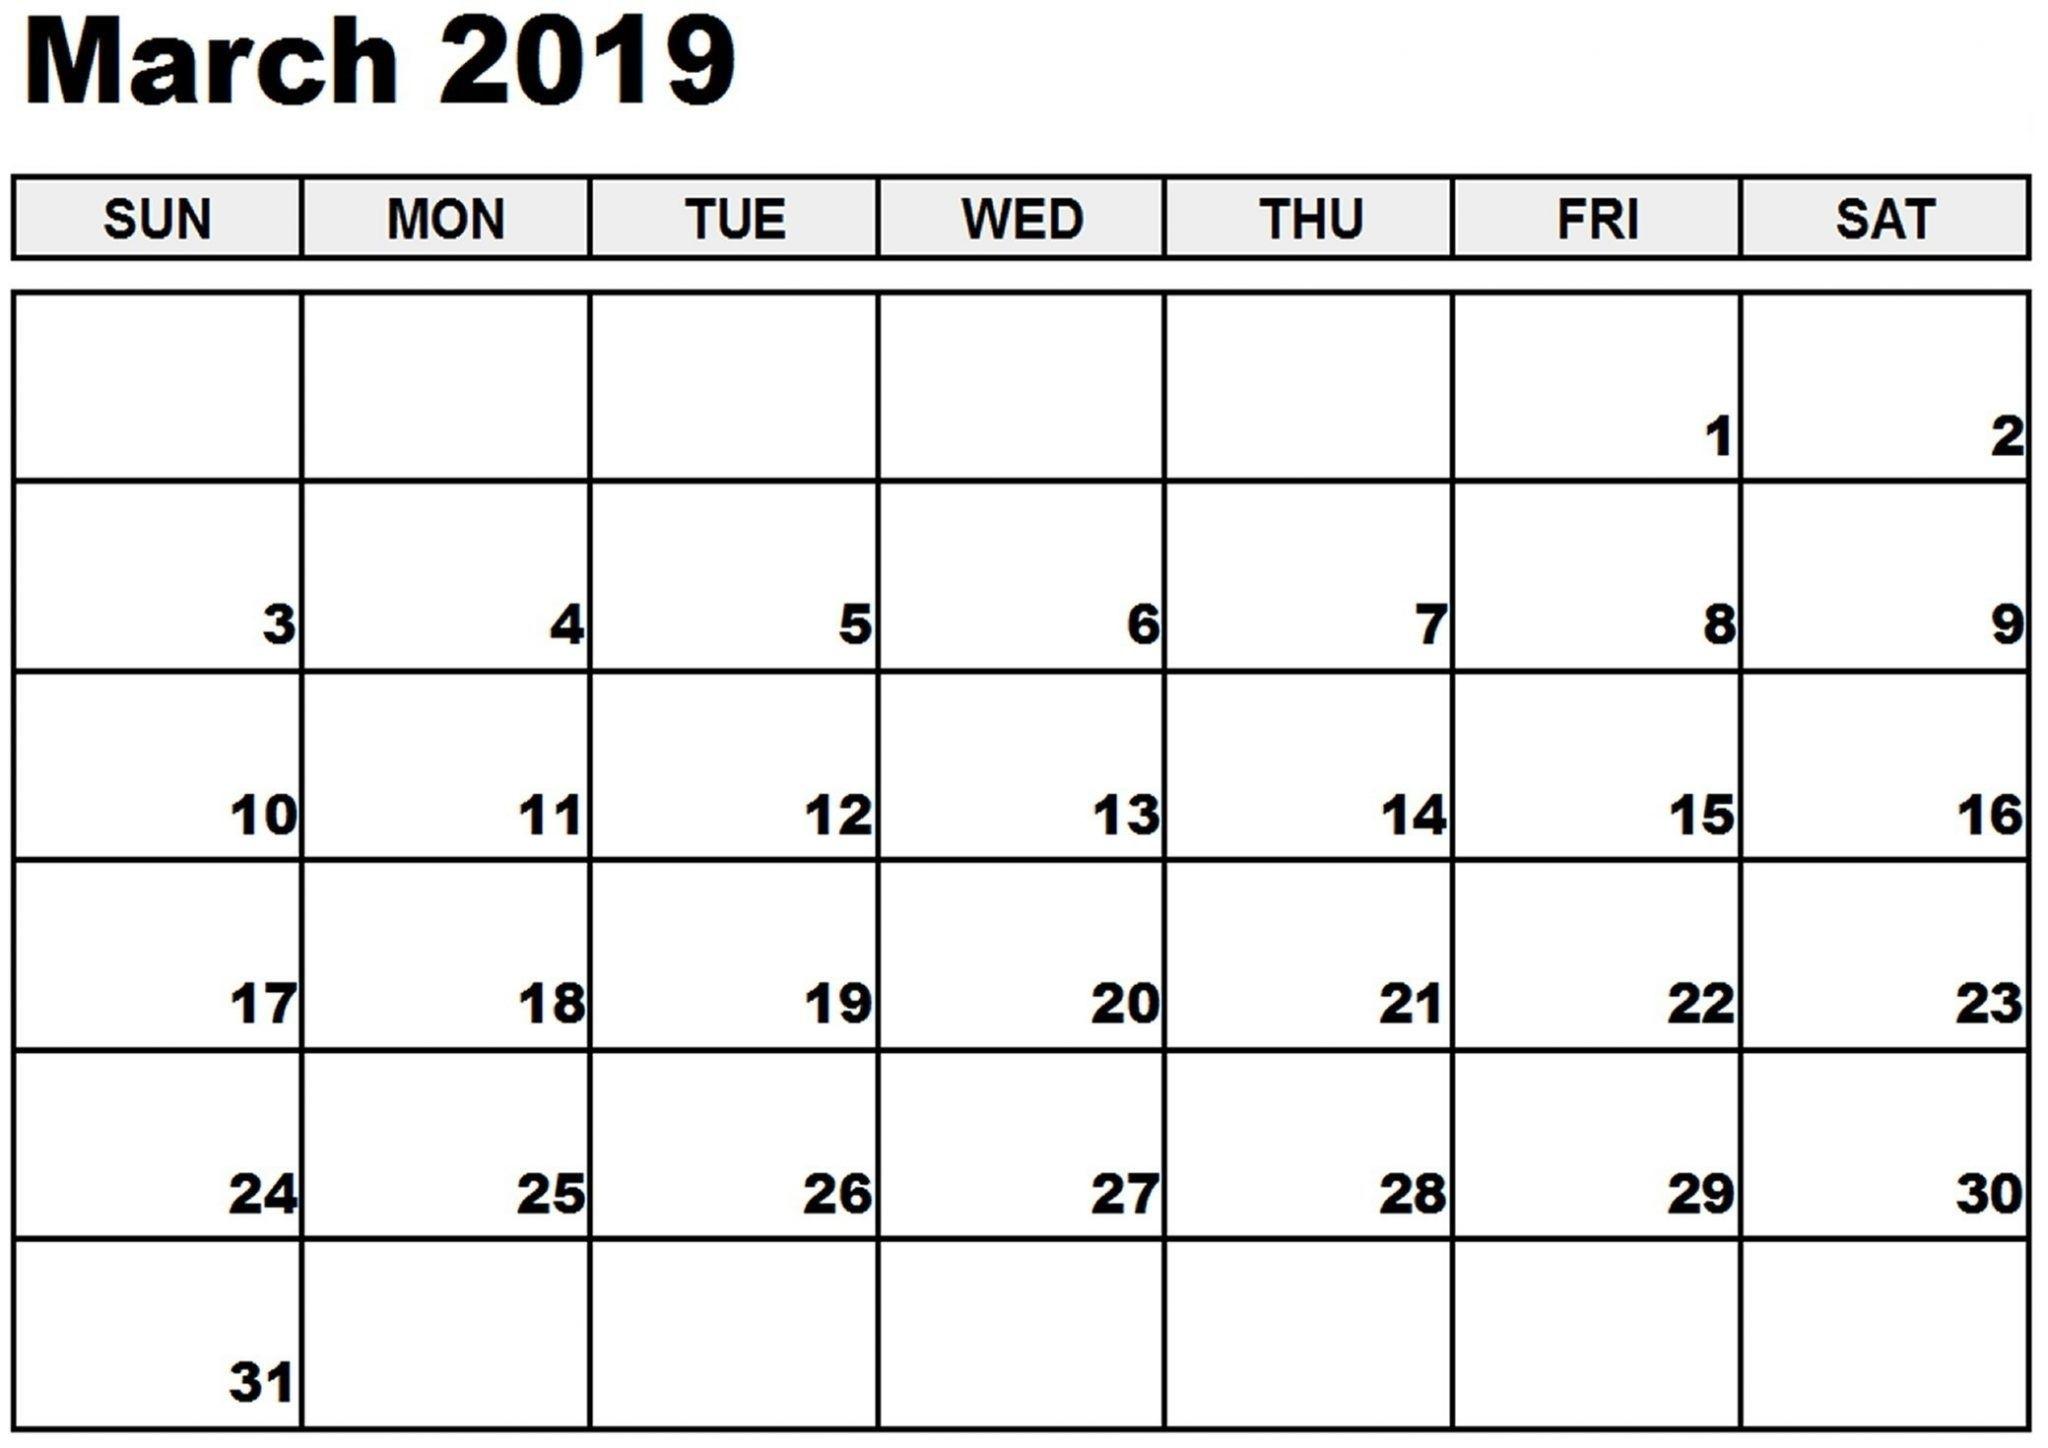 2019 March Calendar #march #marchcalendar #march2019Calendar_Calendar 2019 Printing Singapore